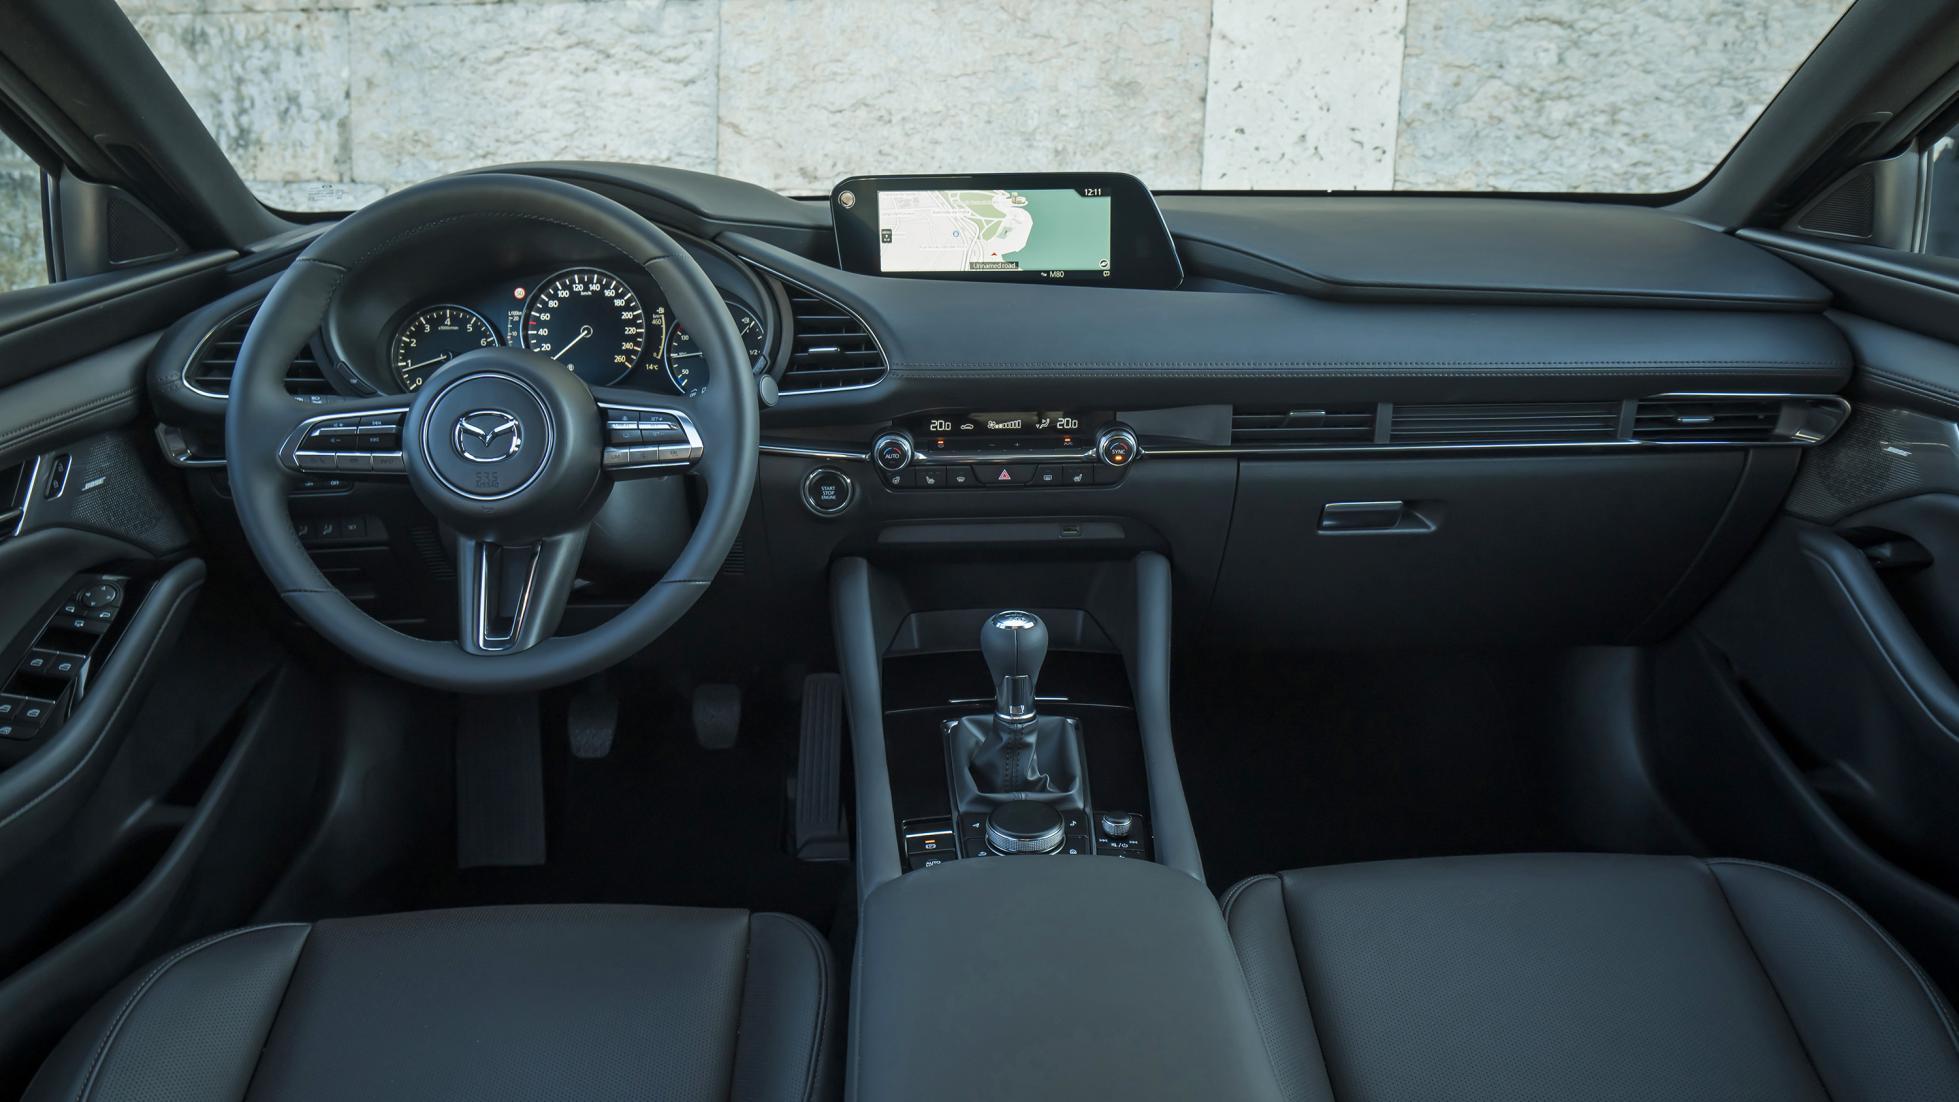 https://www.whatcar.lv/cars/Mazda/3/749bb2fa80a9eb03ee22b9b39786f039.jpg